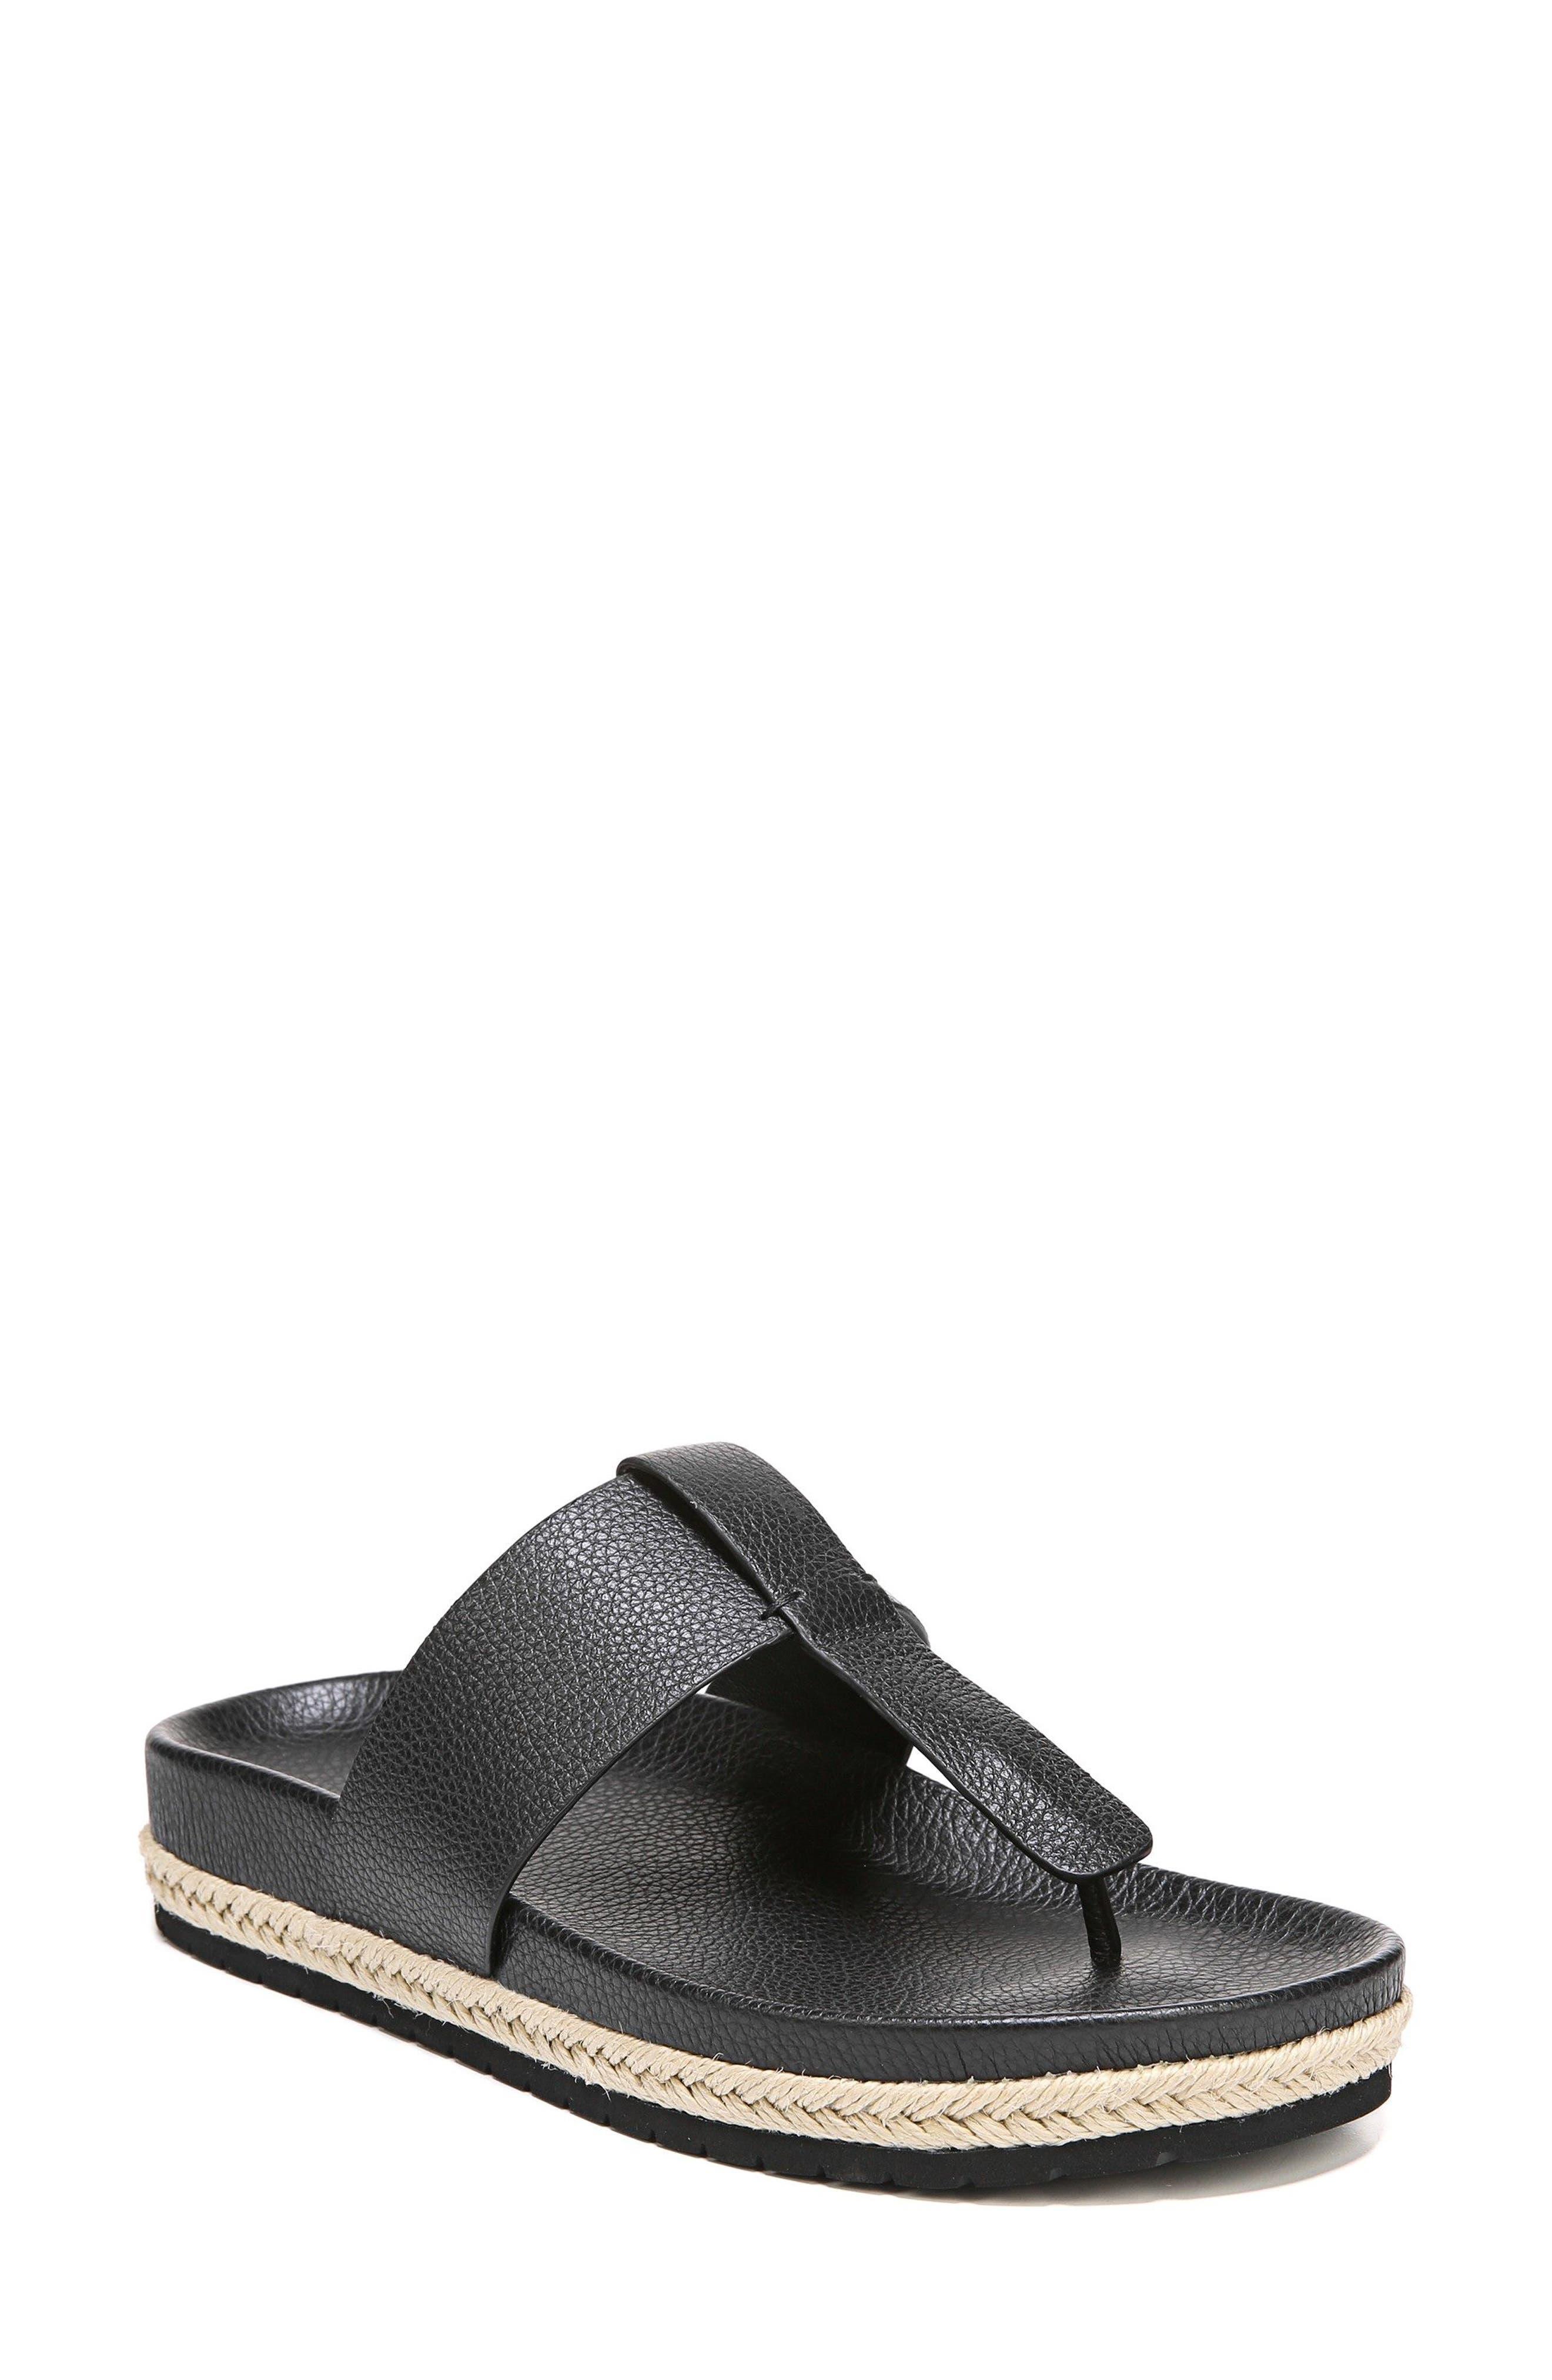 Avani T-Strap Flat Sandal,                         Main,                         color, 001